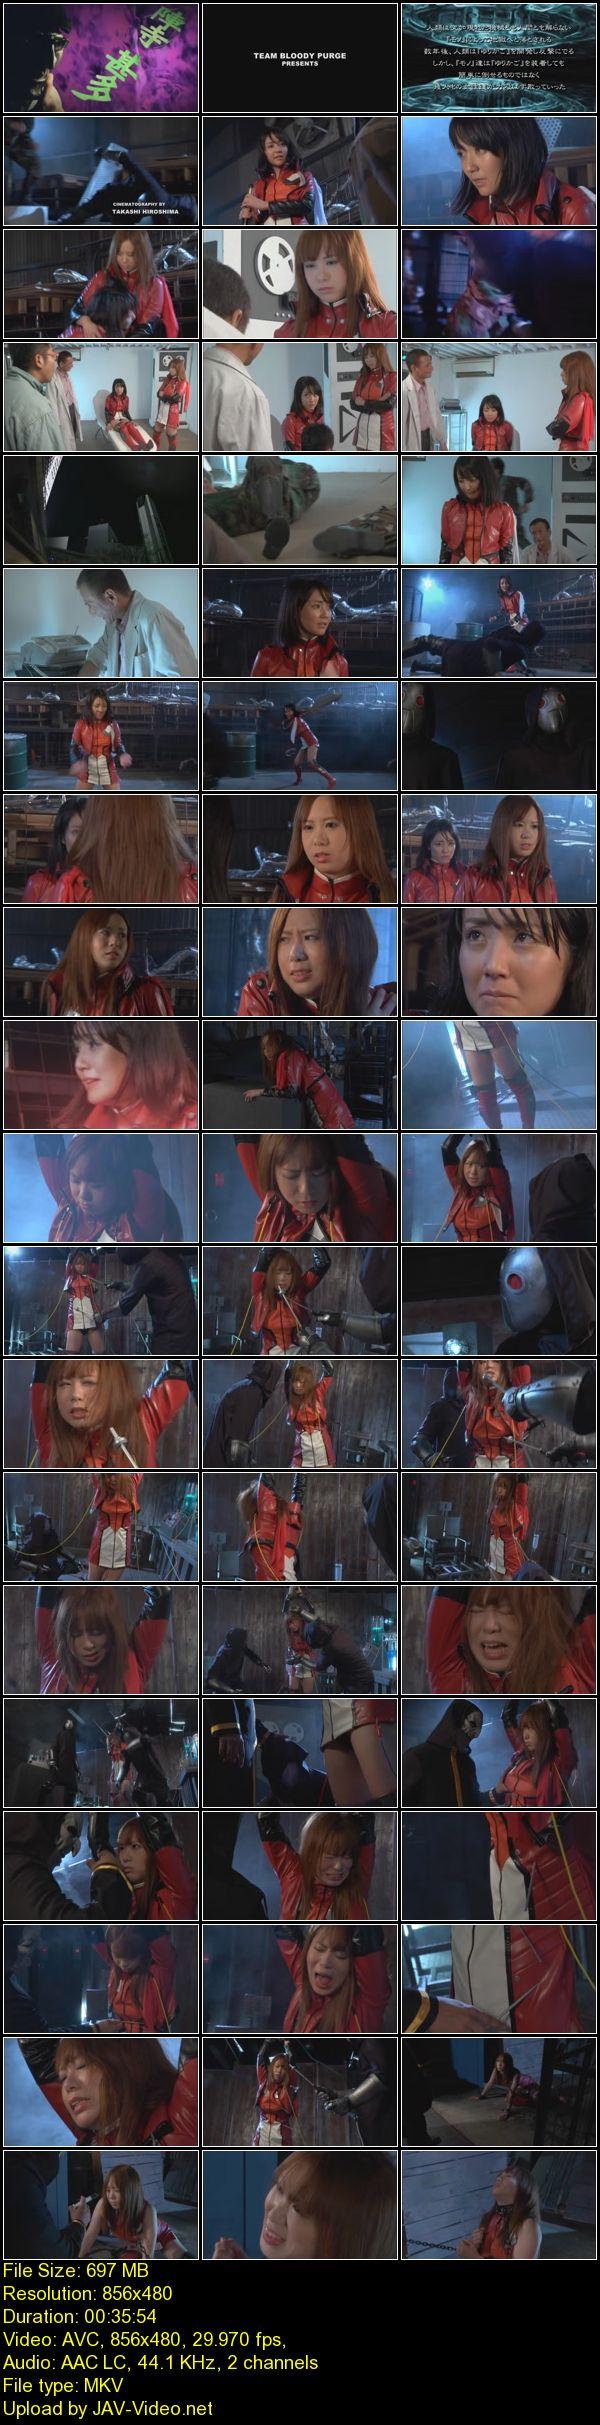 JAV Download Sayo Arimoto, Akari Nishiyama [TGGP 57] BLOODY PURGE(ブラッディパージ) 身代わり 戦隊・アニメ・ゲーム 102分 2013 11 22